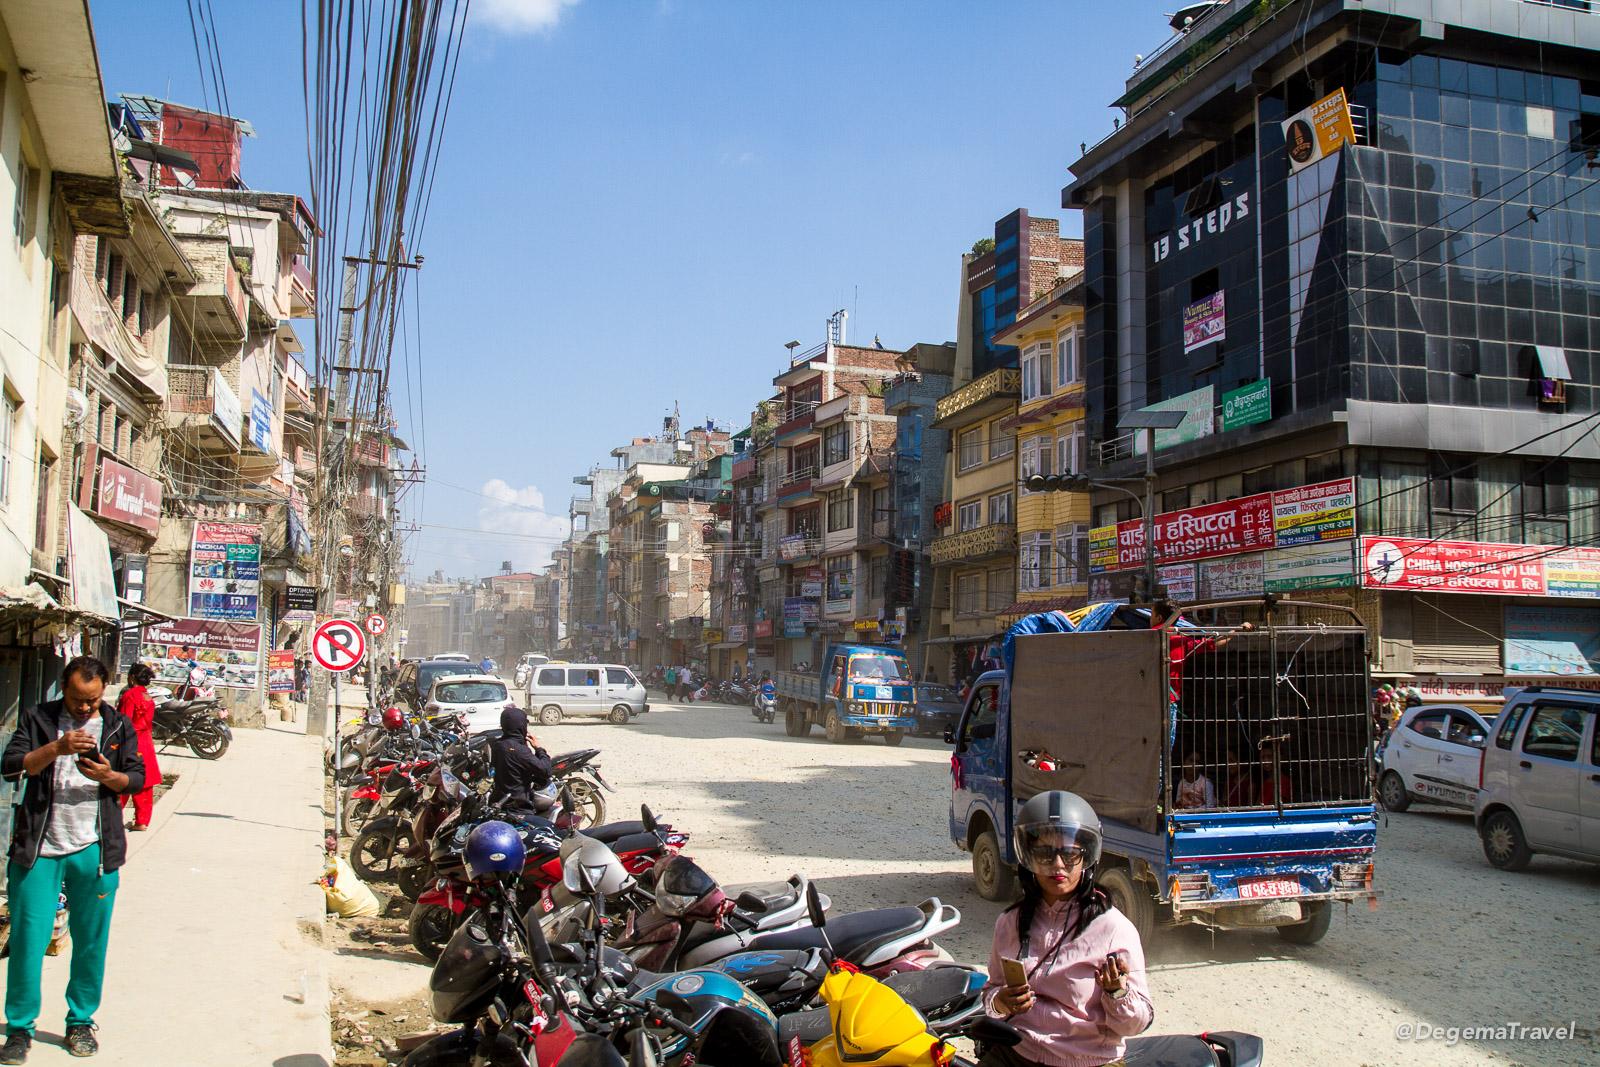 The street outside Boudha Stupa in Kathmandu, Nepal